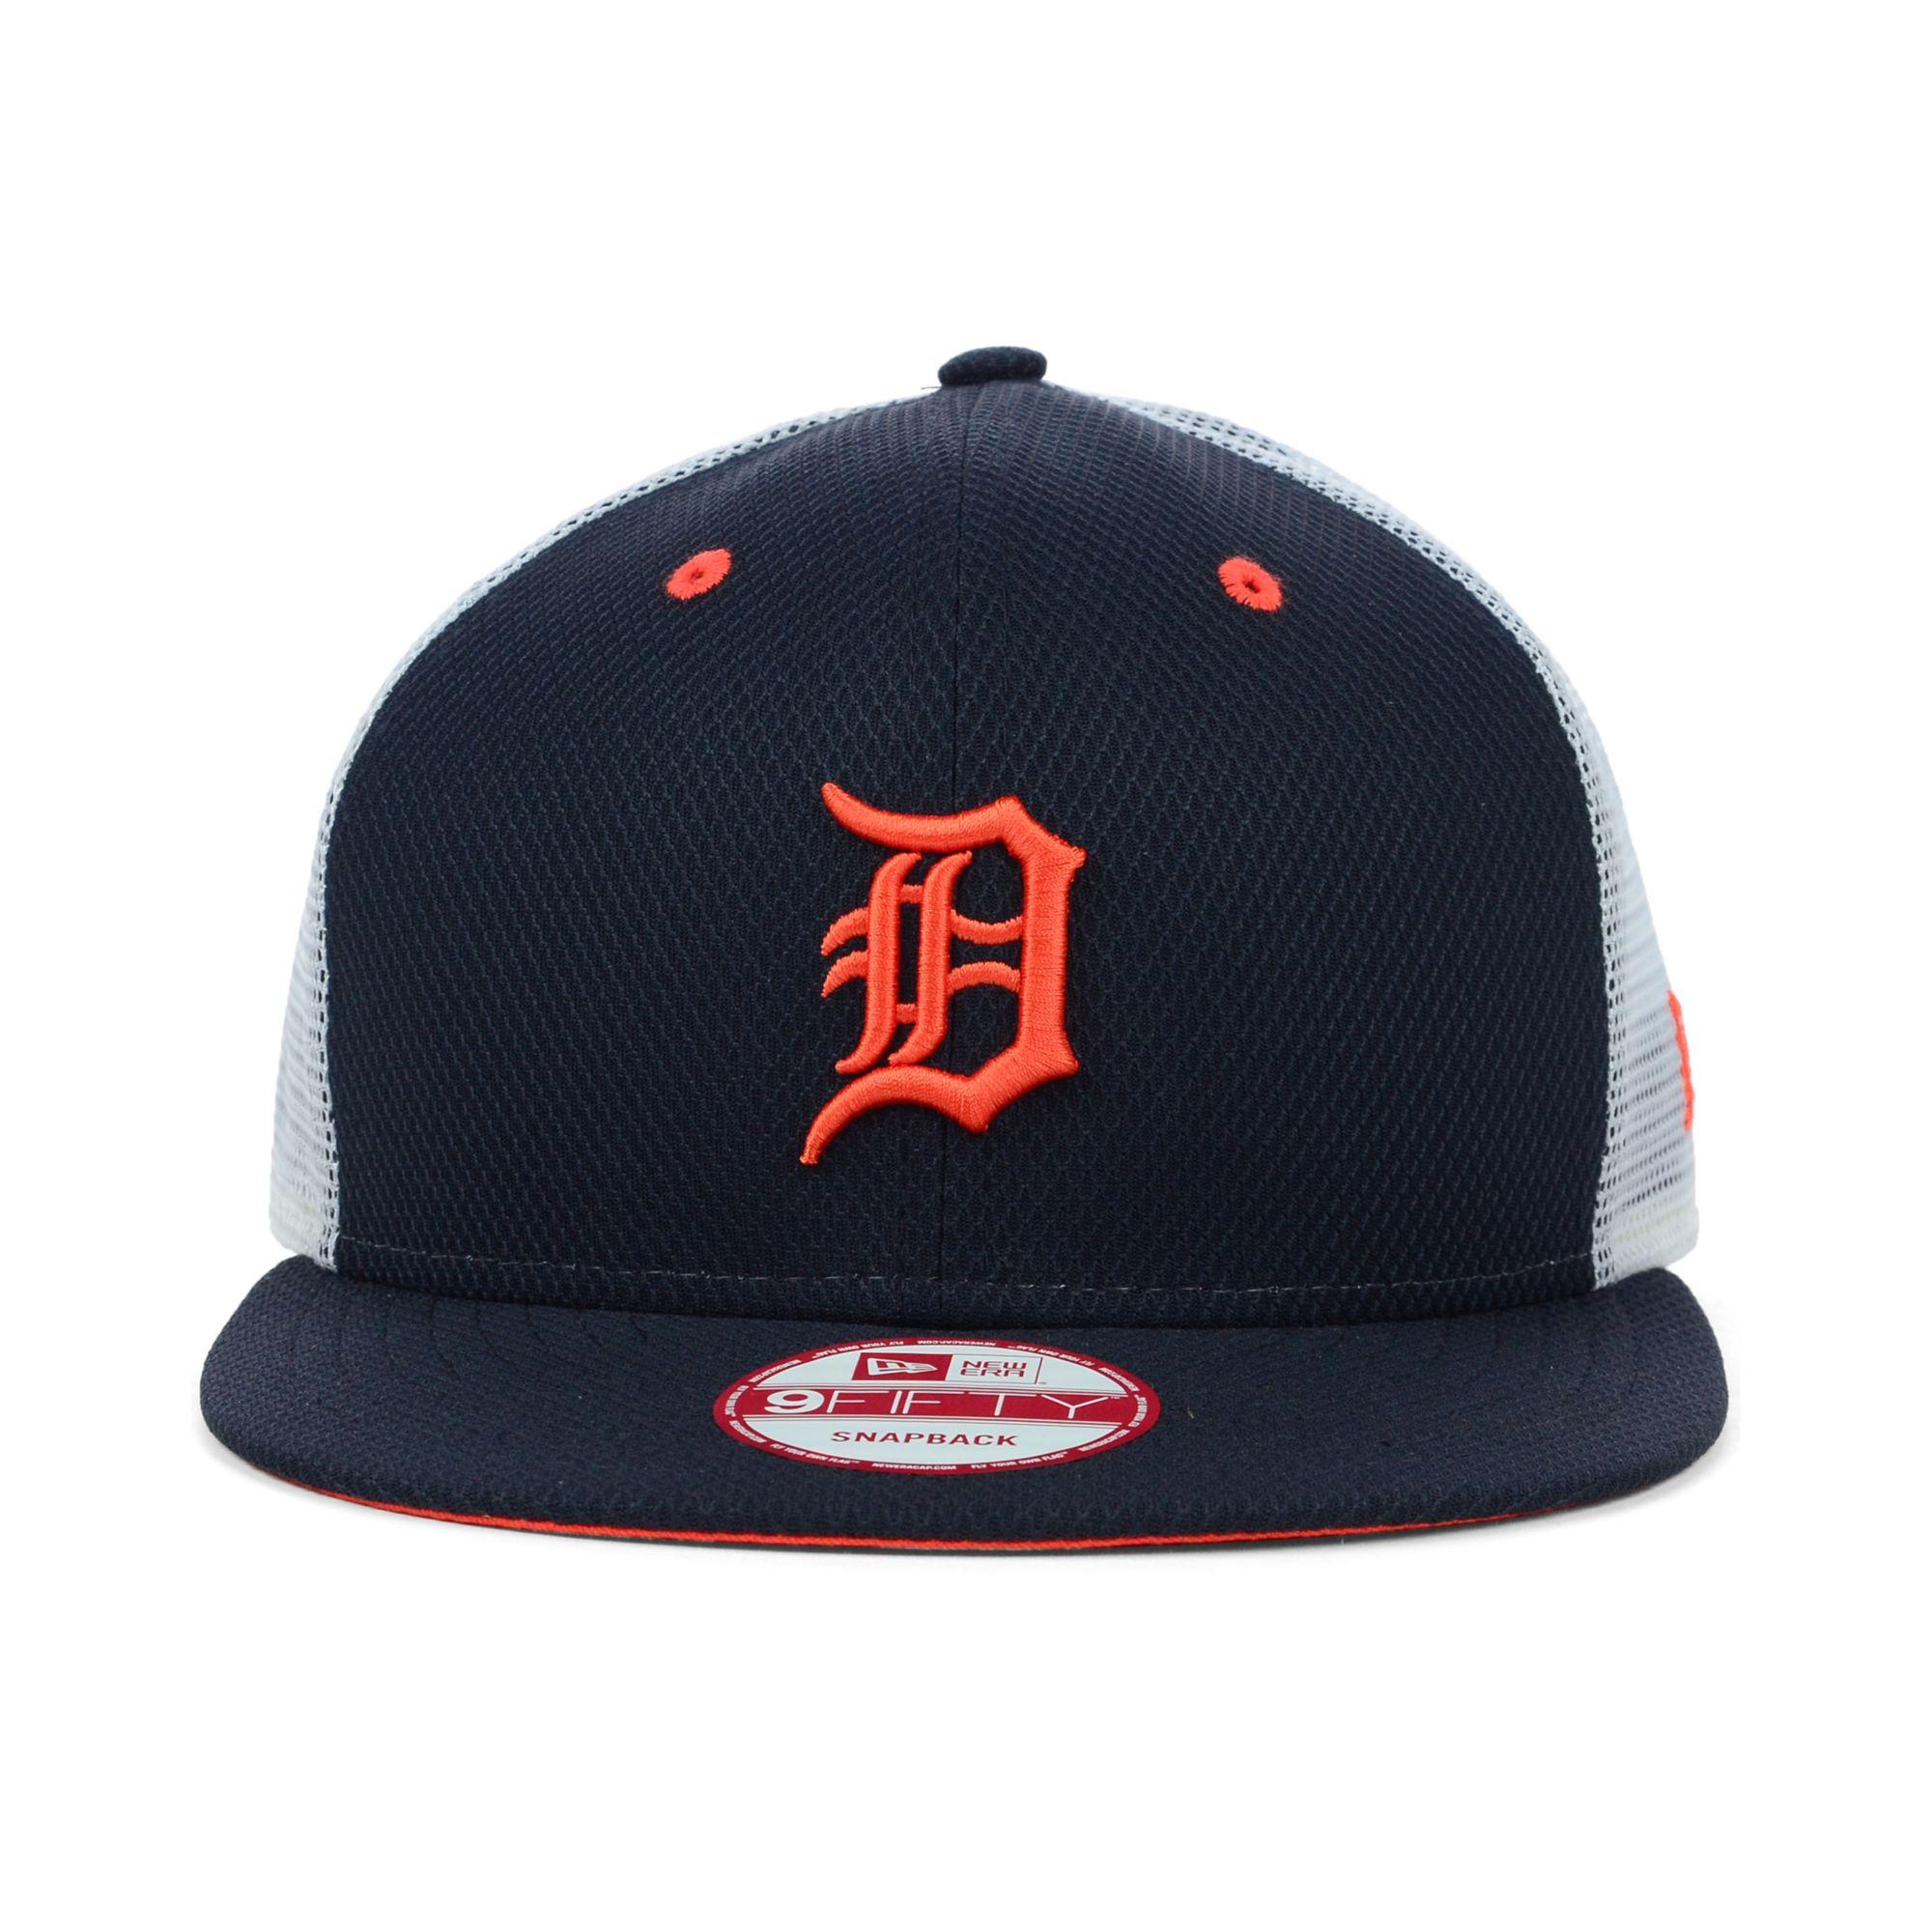 e6a2fb281b8 Lyst - KTZ Detroit Tigers Mlb Diamond Mesh 9fifty Snapback Cap in ...